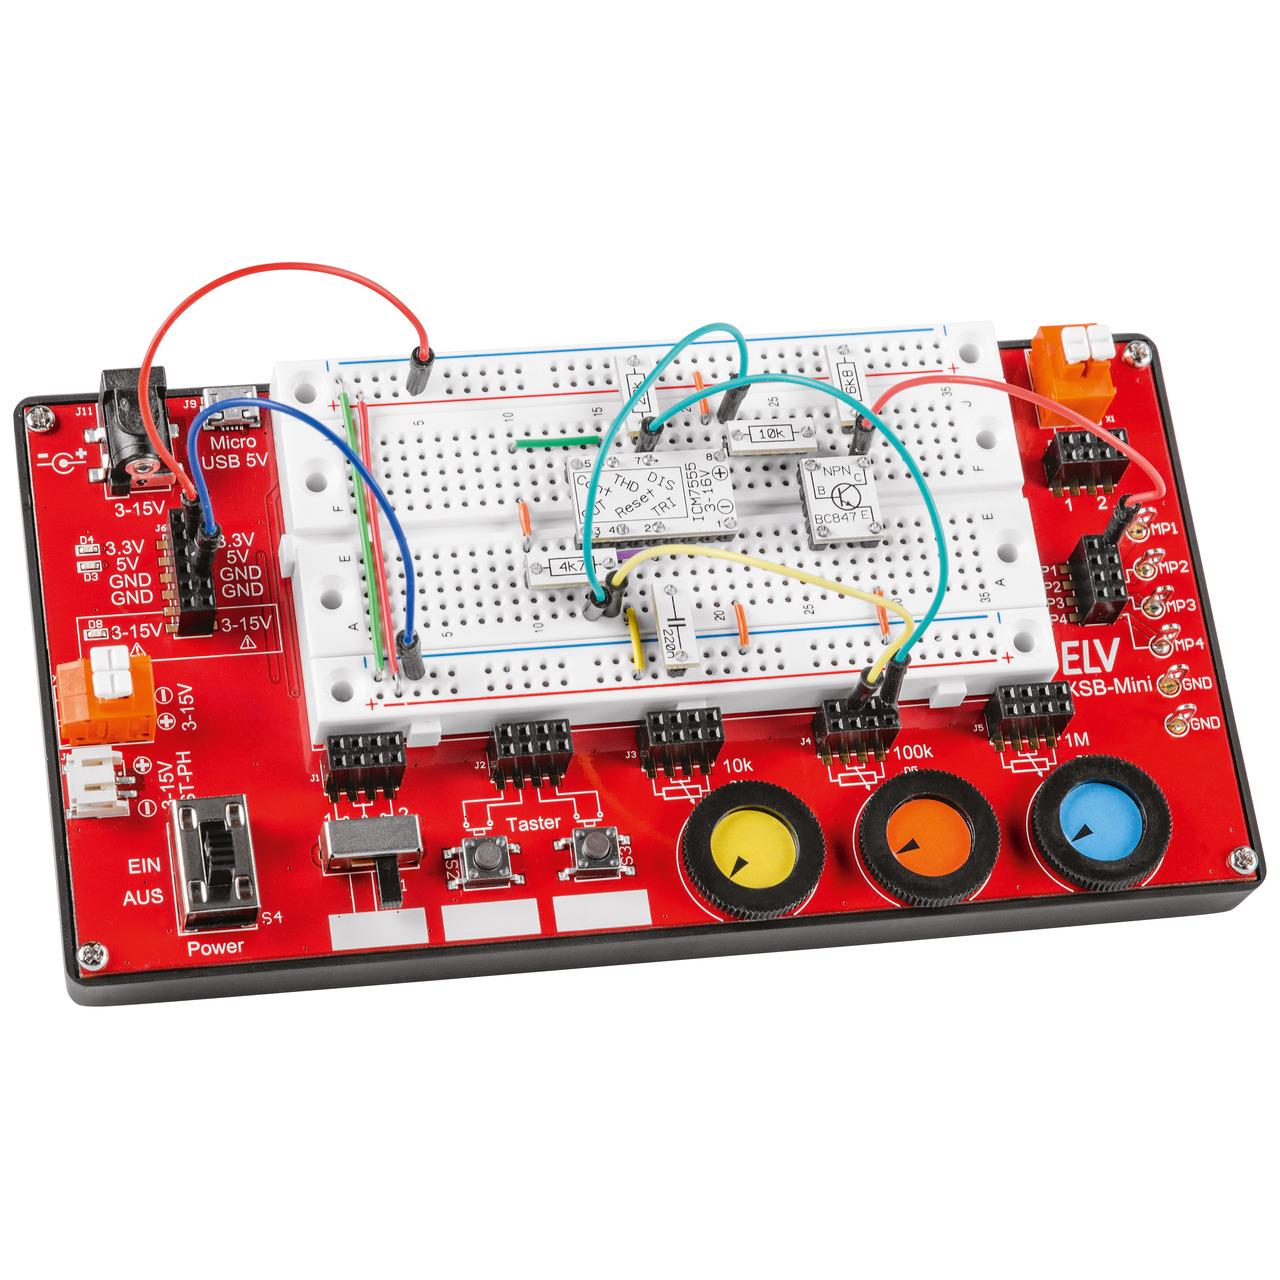 ELV Experimentier-Steckboard EXSB-Mini- Fertiggerät